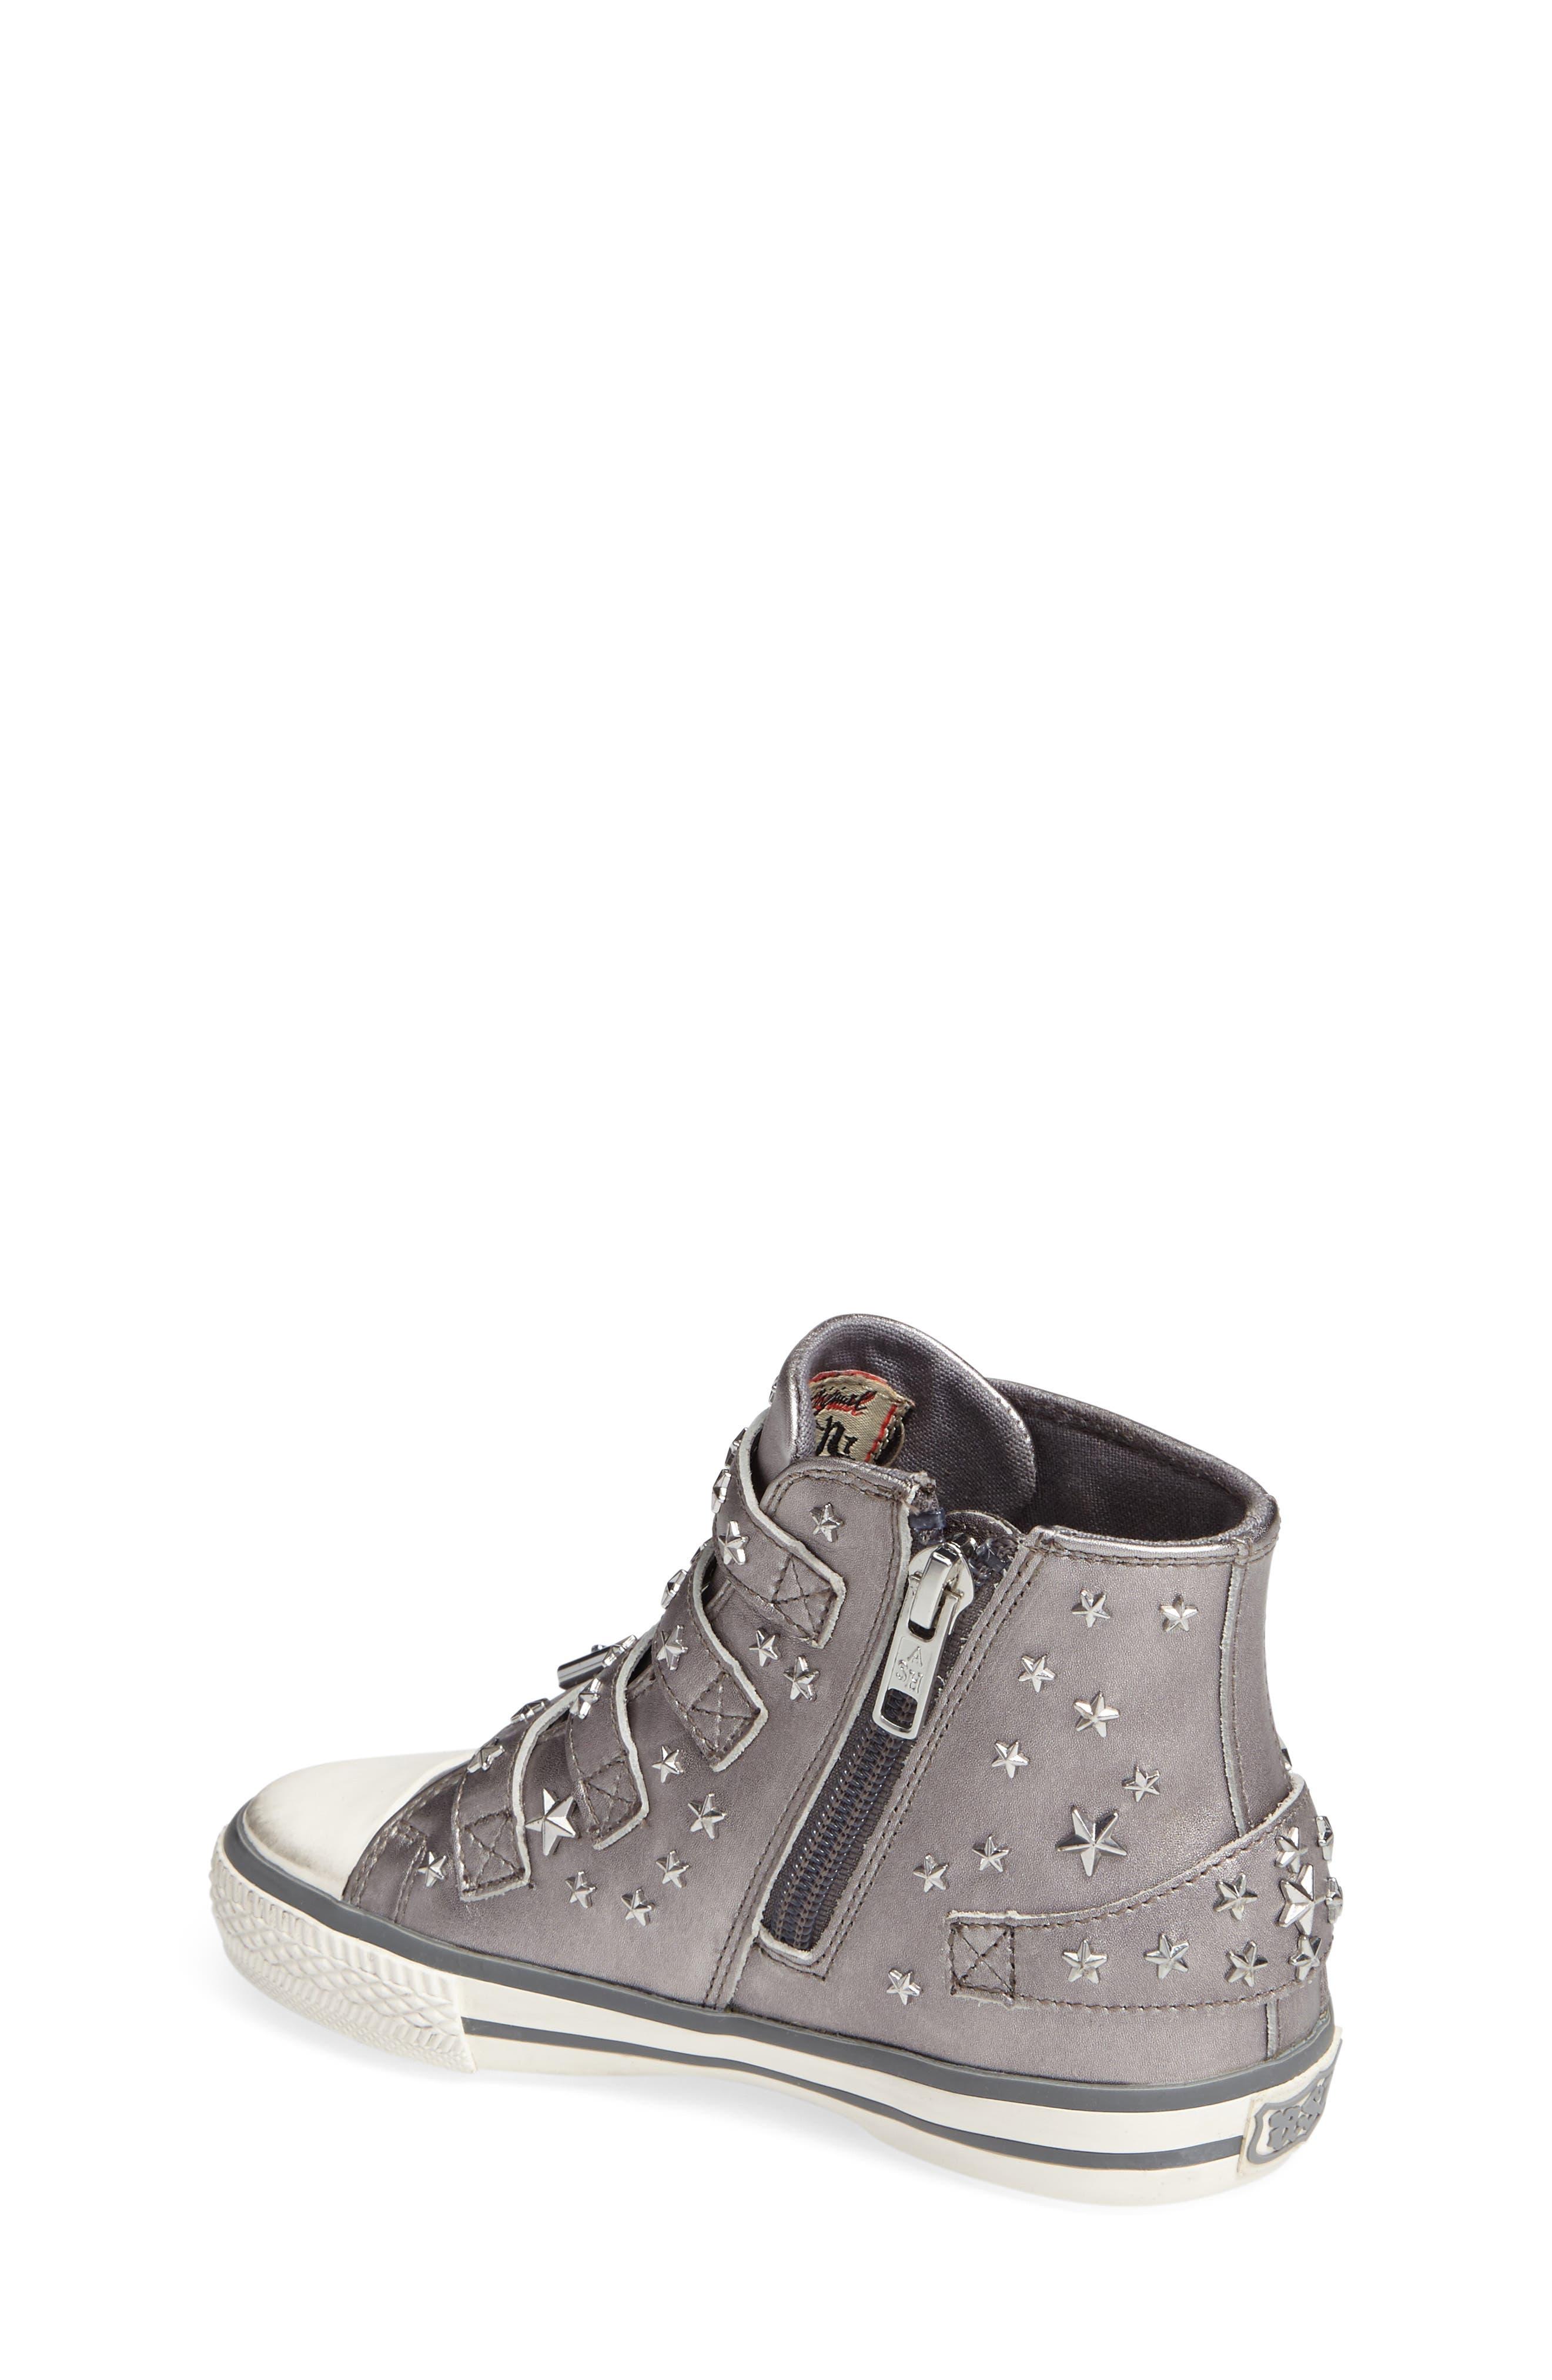 Alternate Image 2  - Ash Vava Star Stud Sneaker (Toddler, Little Kid & Big Kid)